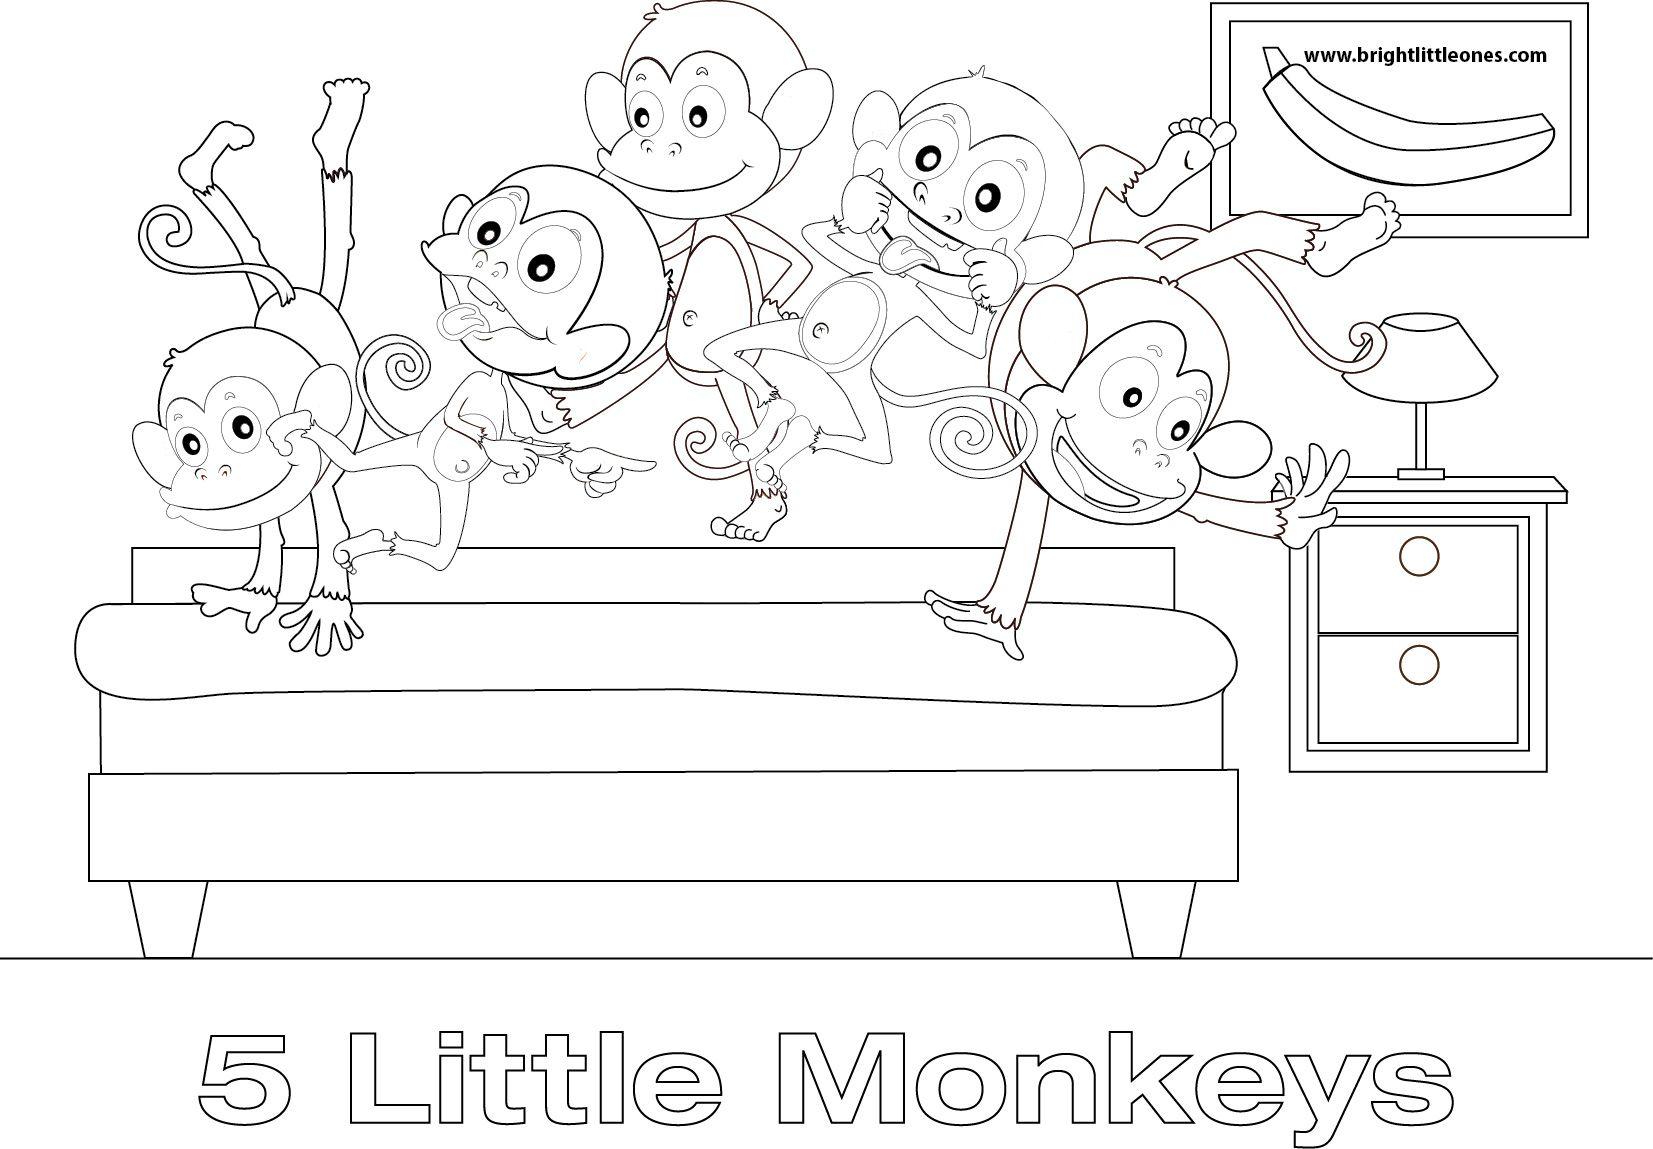 free printable! five little monkeys coloring sheet